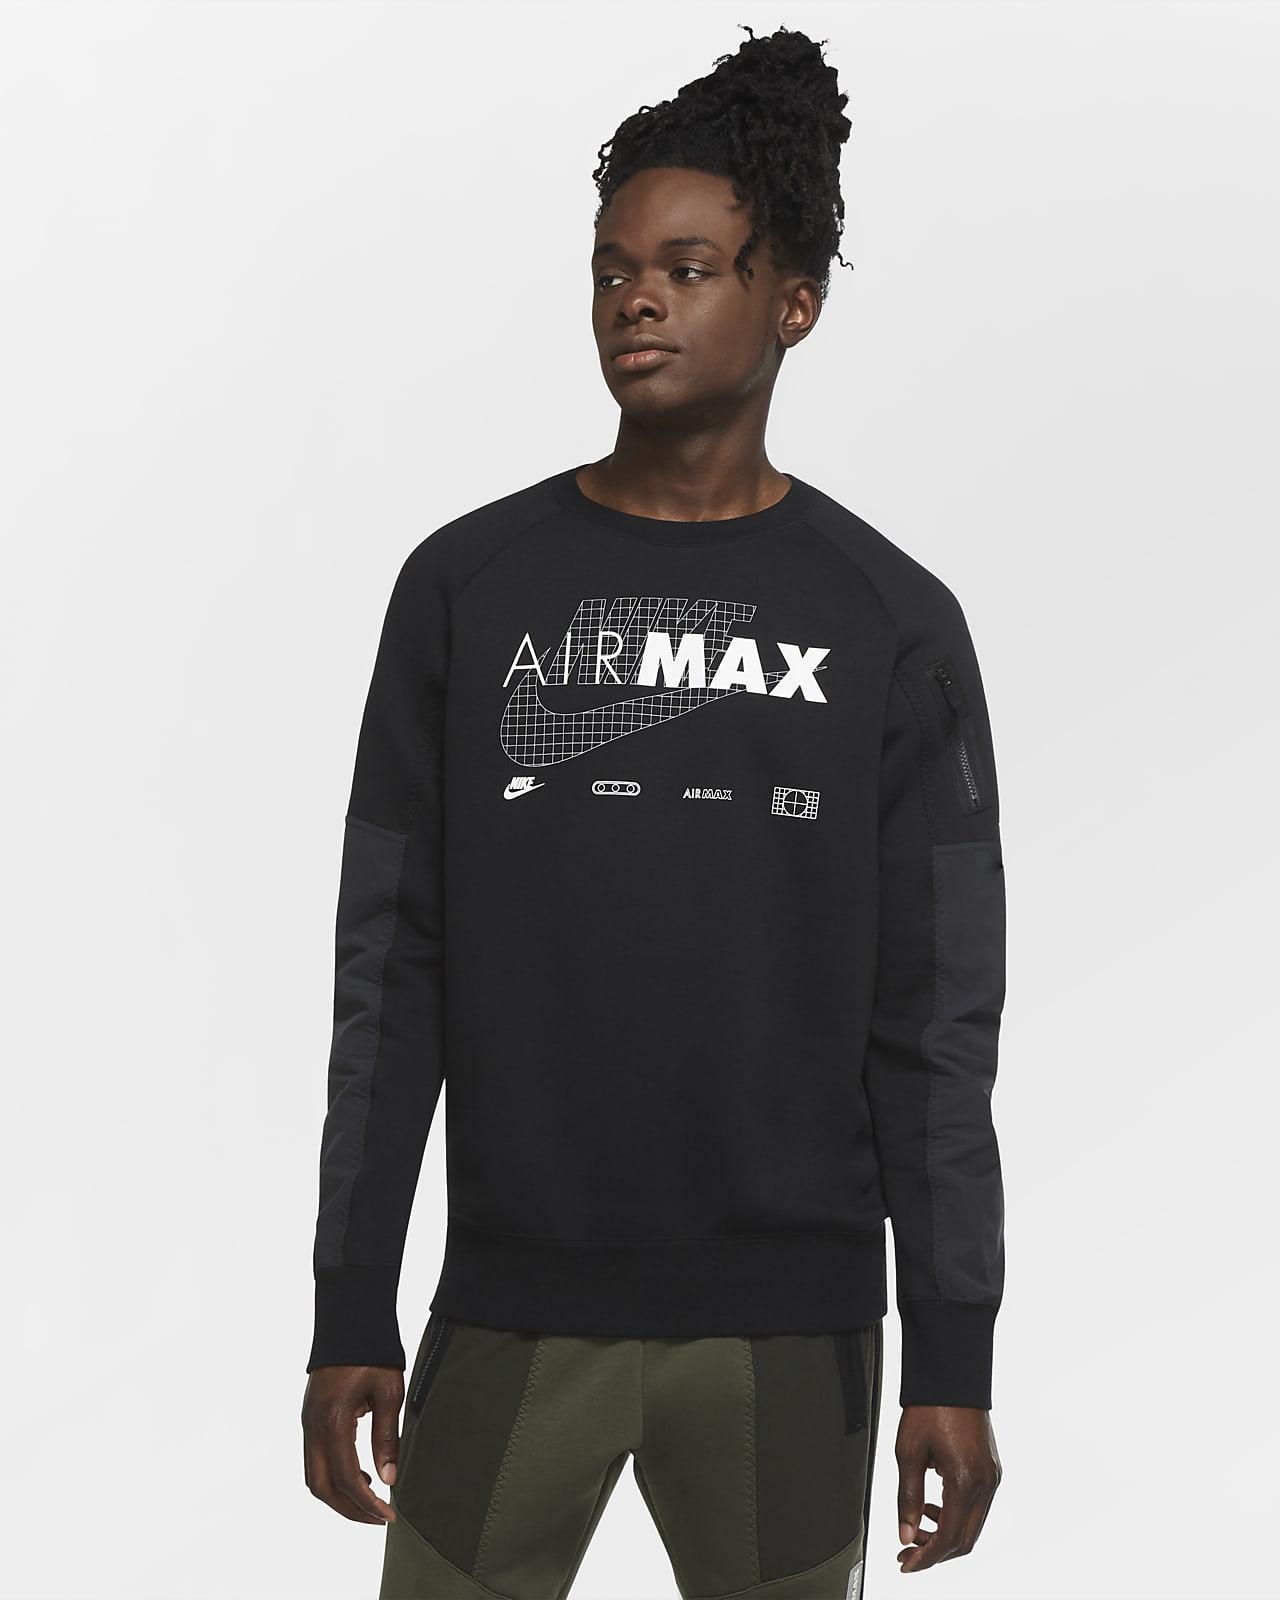 Nike Sportswear Air Max Men's Fleece Crew